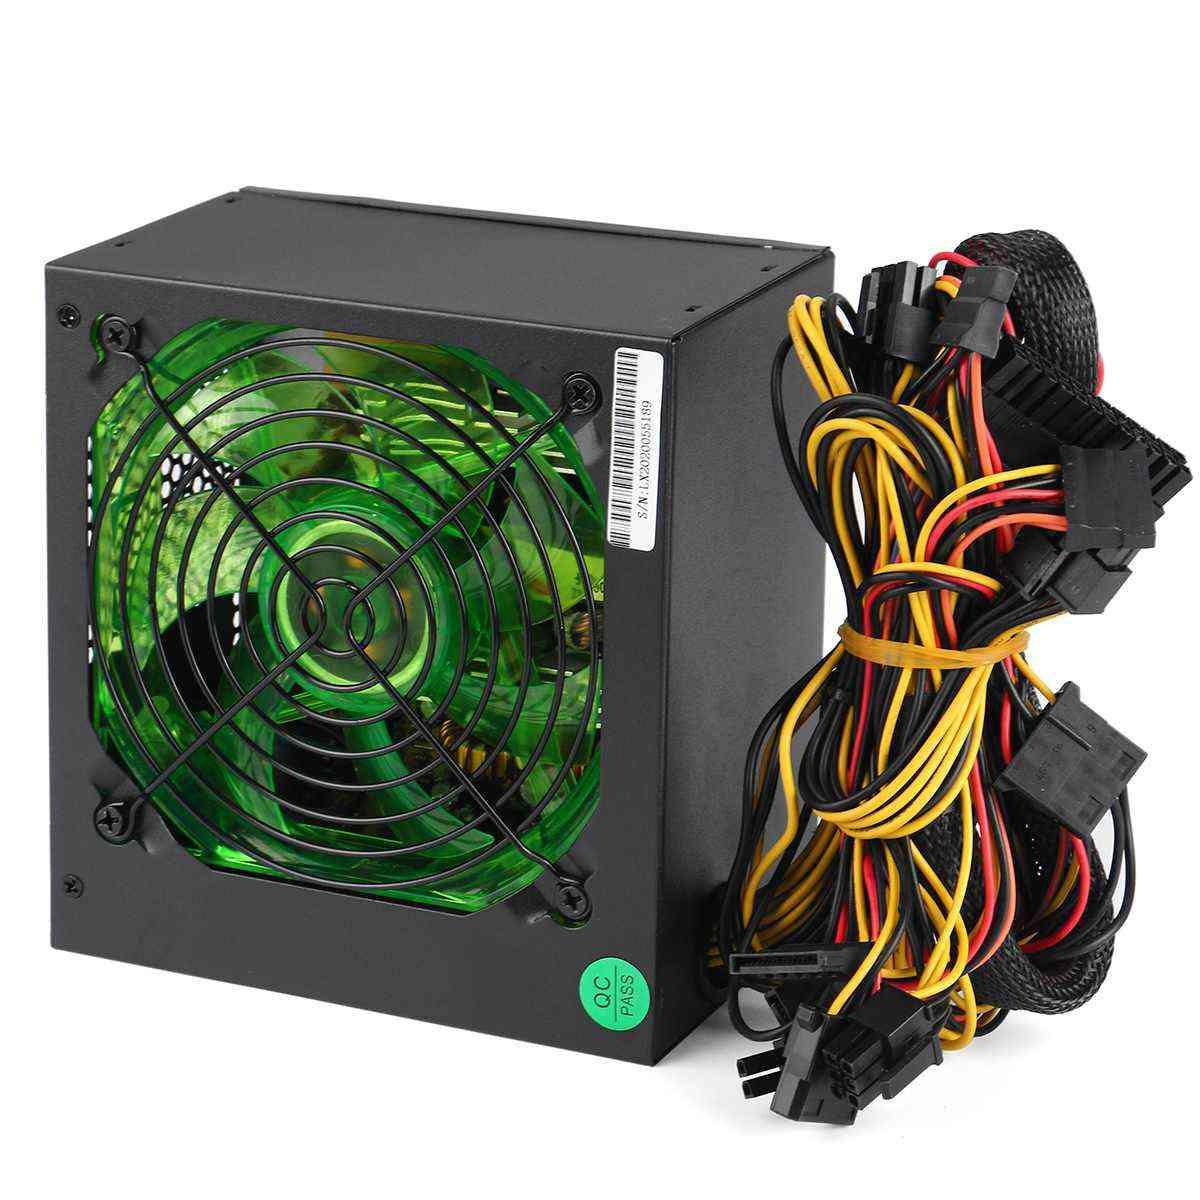 Max 800w Pci Sata 220v Atx 12v Gaming Pc Power Supply 24pin/molex/sata Led Fan